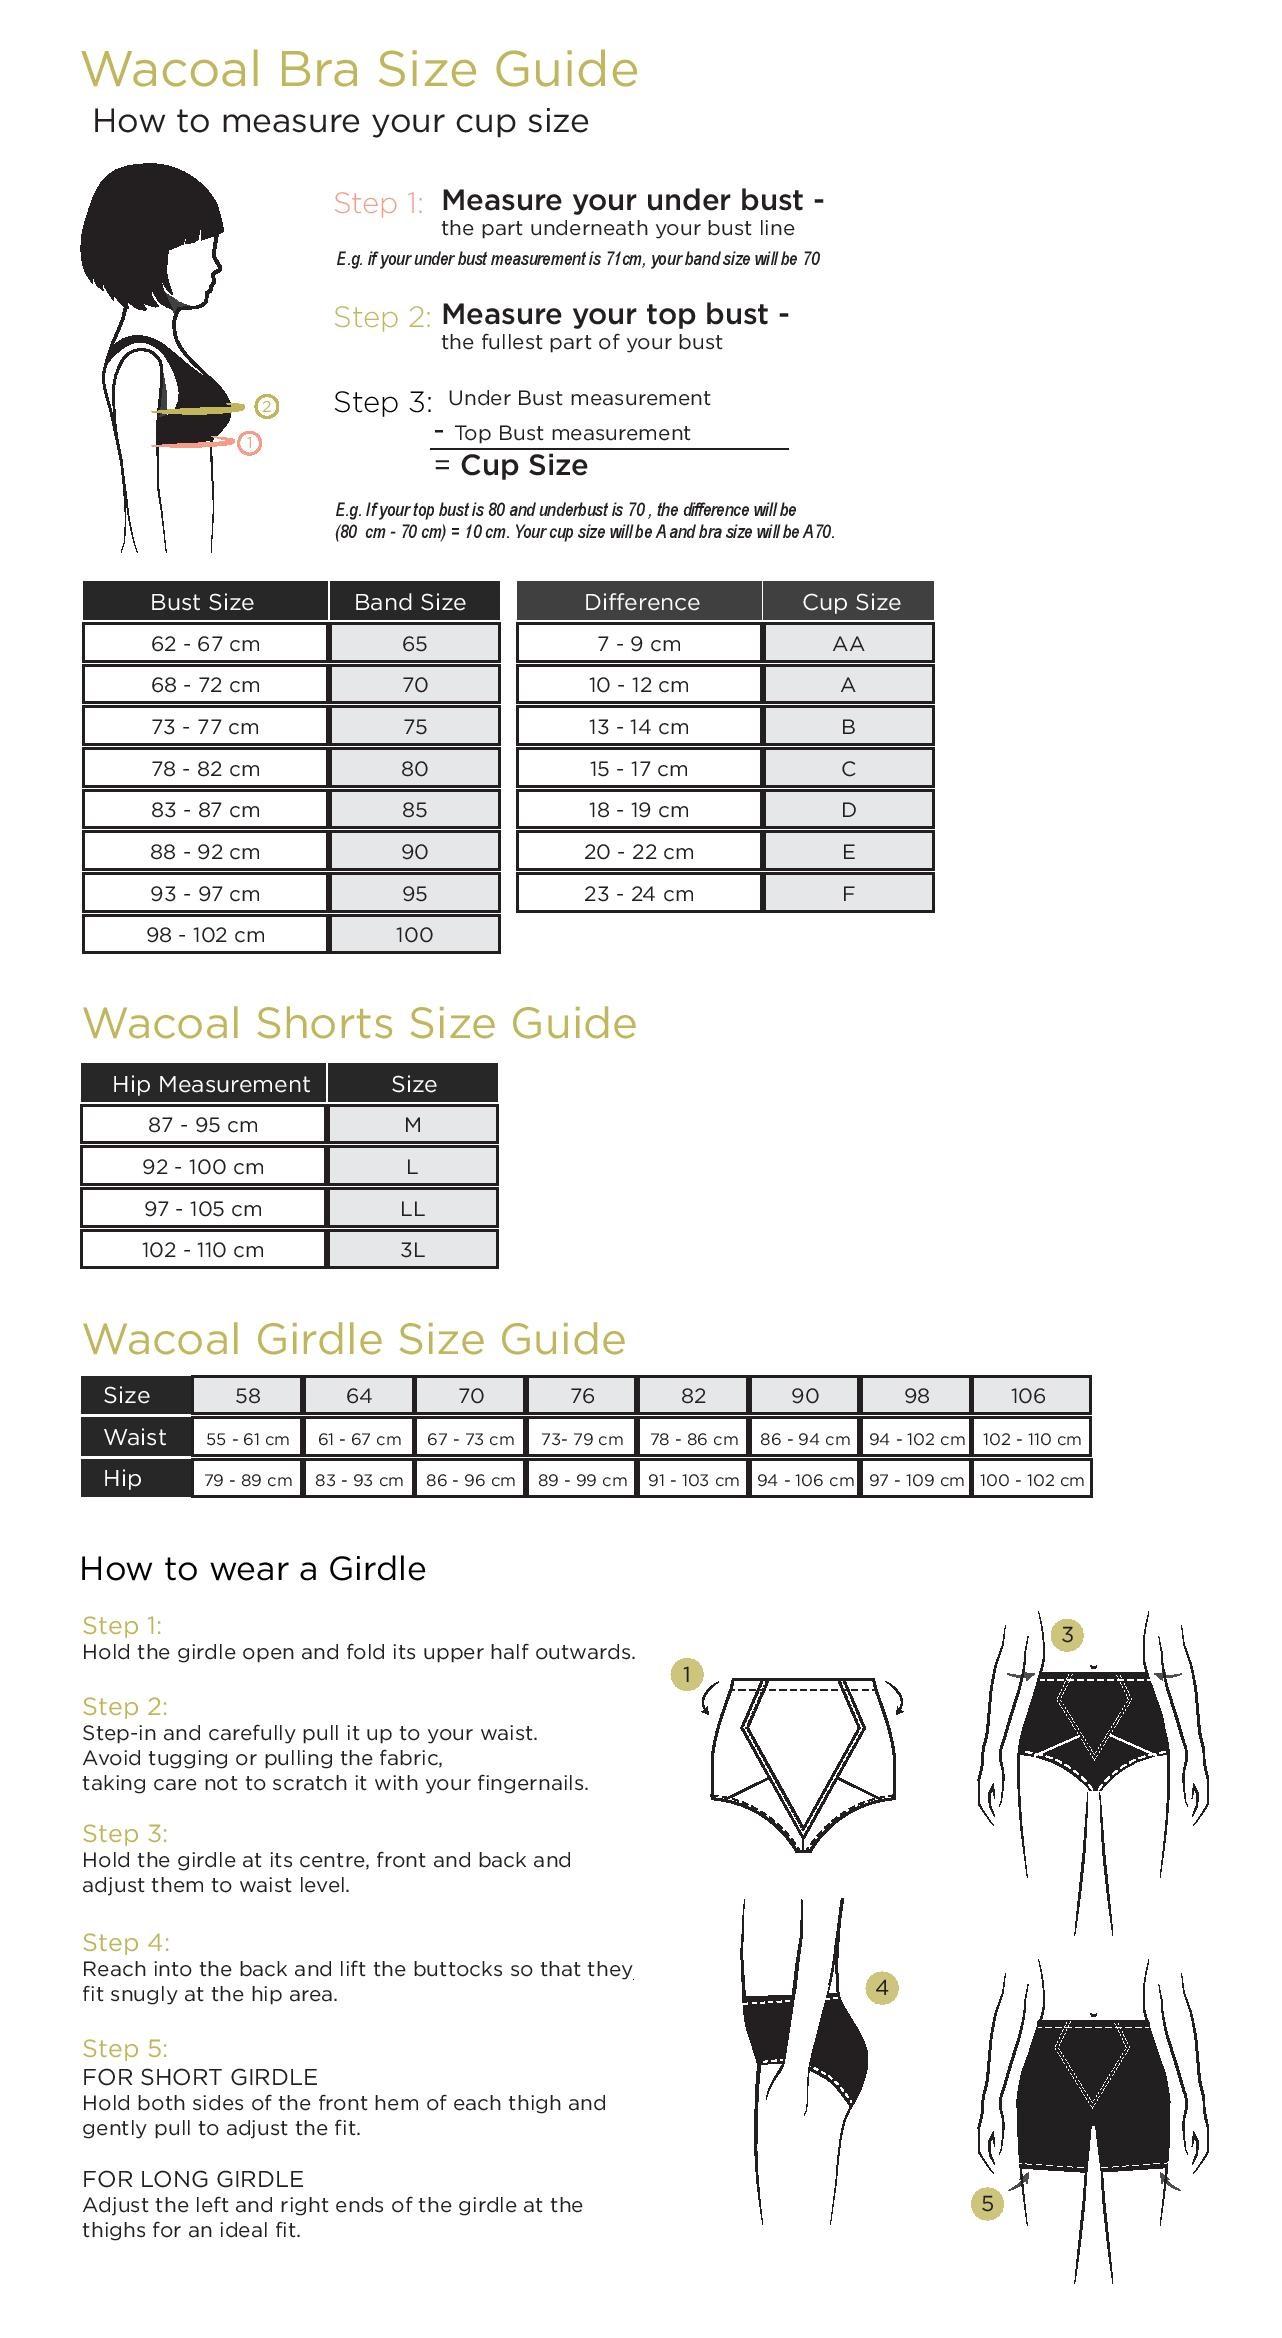 d630aaf444e6 Size Guide | Wacoal Singapore